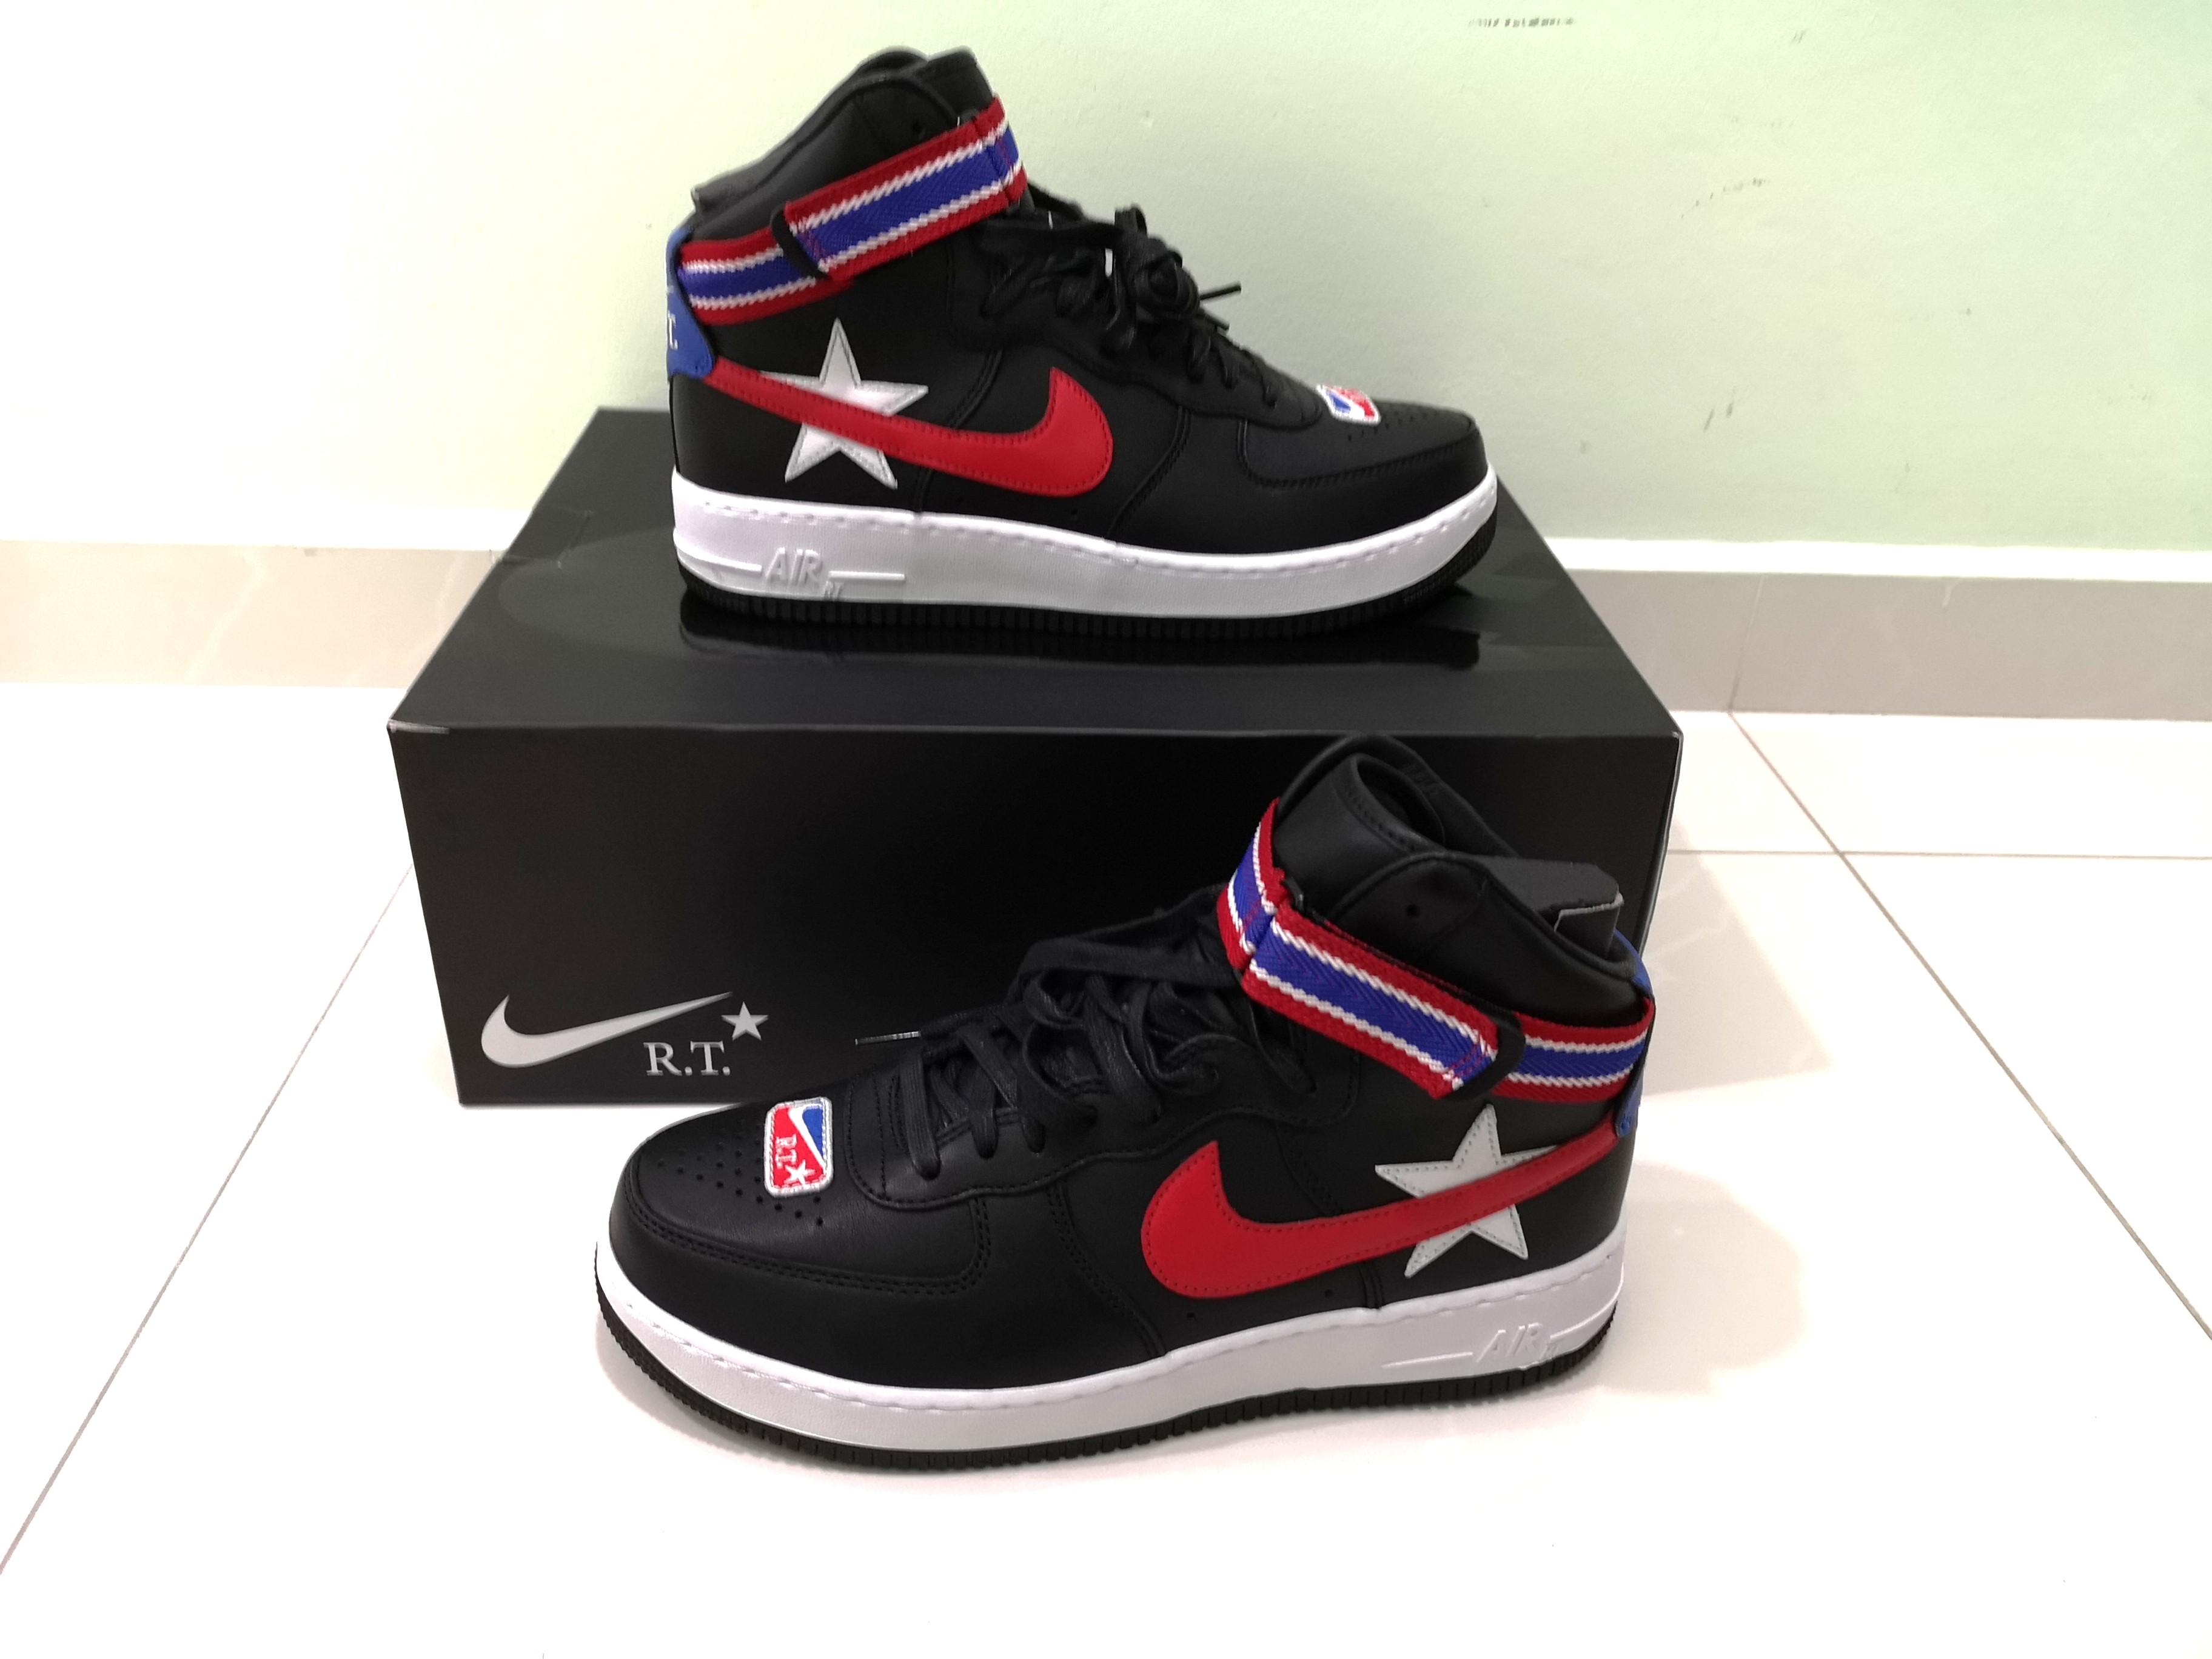 quality design 00ec2 abfe9 NikeLab x RT Air Force 1 High Size US 9.5, Men s Fashion, Footwear ...